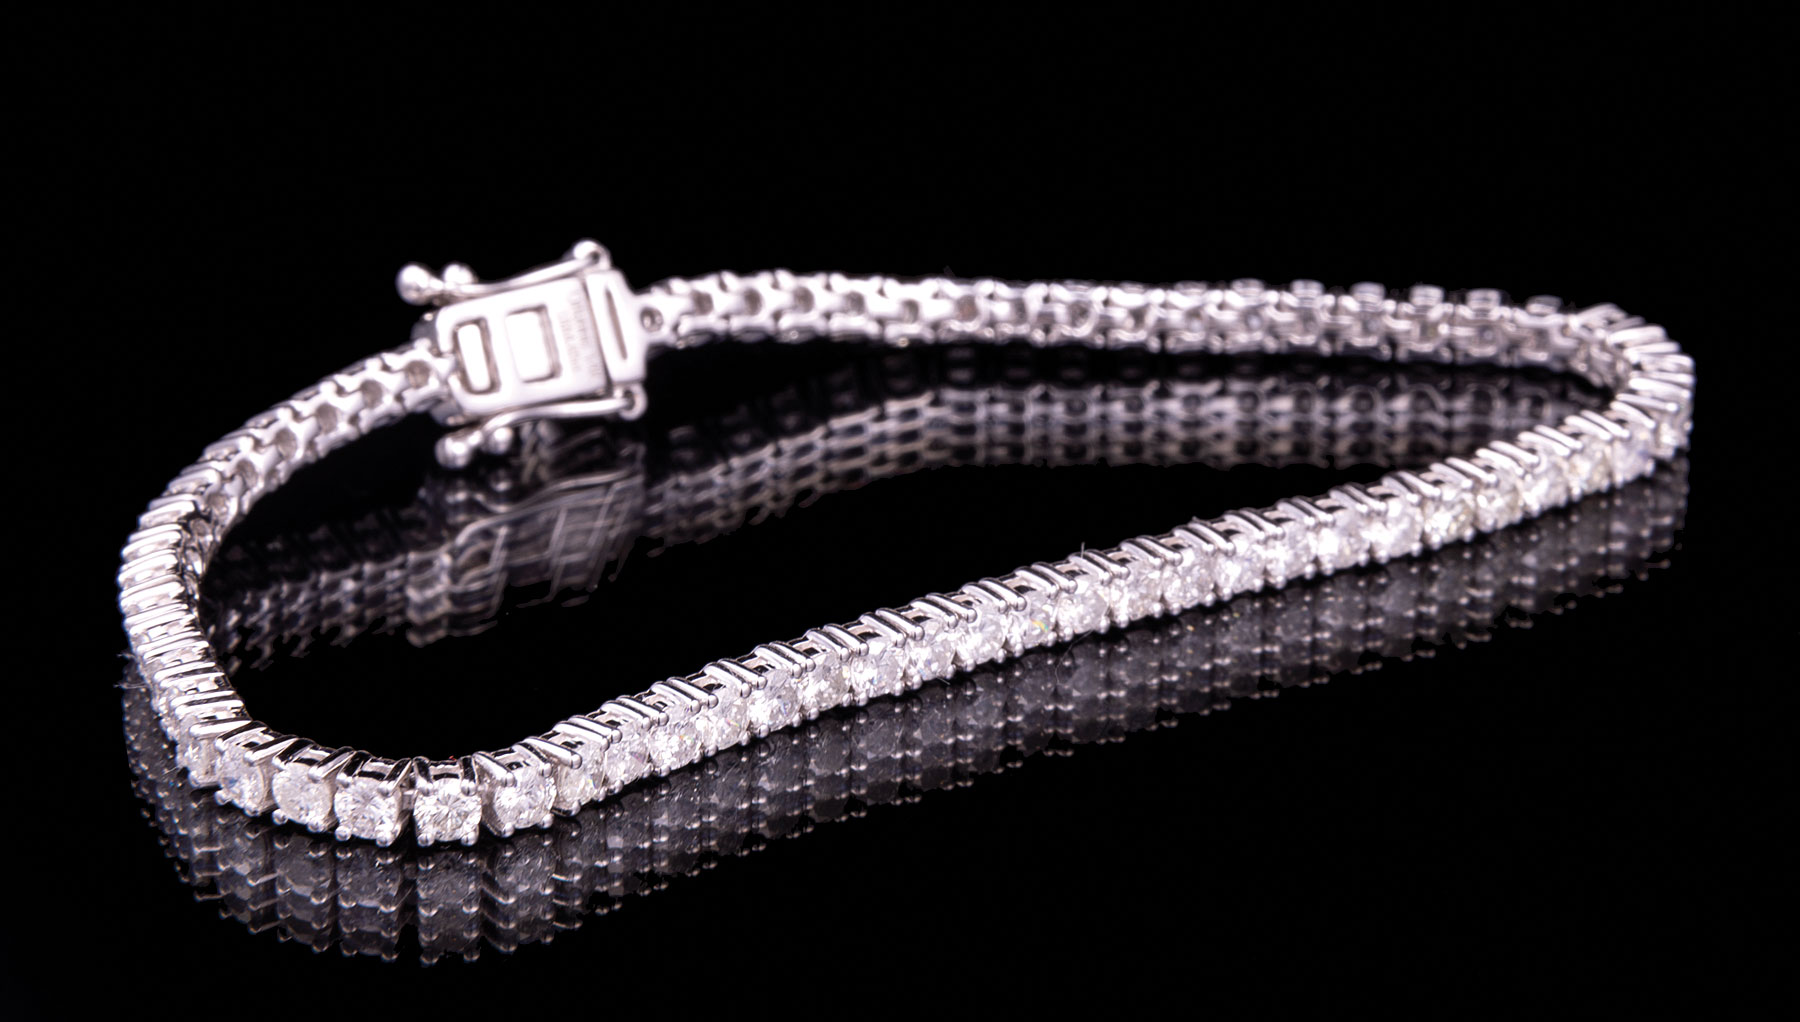 Lot 602 - 14 kt. White Gold and Diamond Tennis Bracelet , 64 prong set round brilliant cut diamonds, total wt.